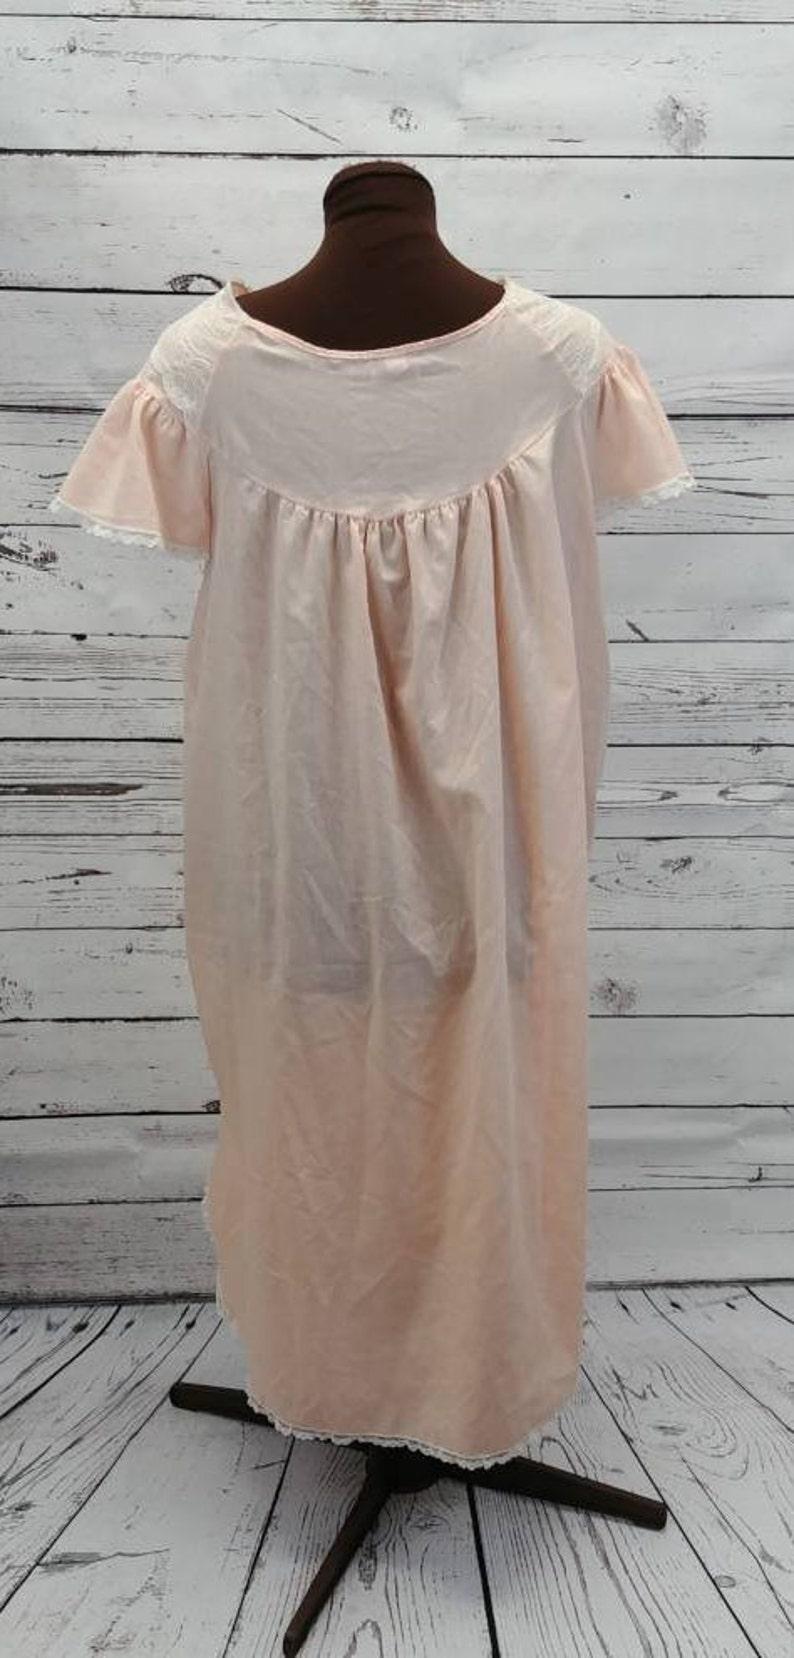 b97546f925 Nancy King Peach Cotton Lace Nightgown